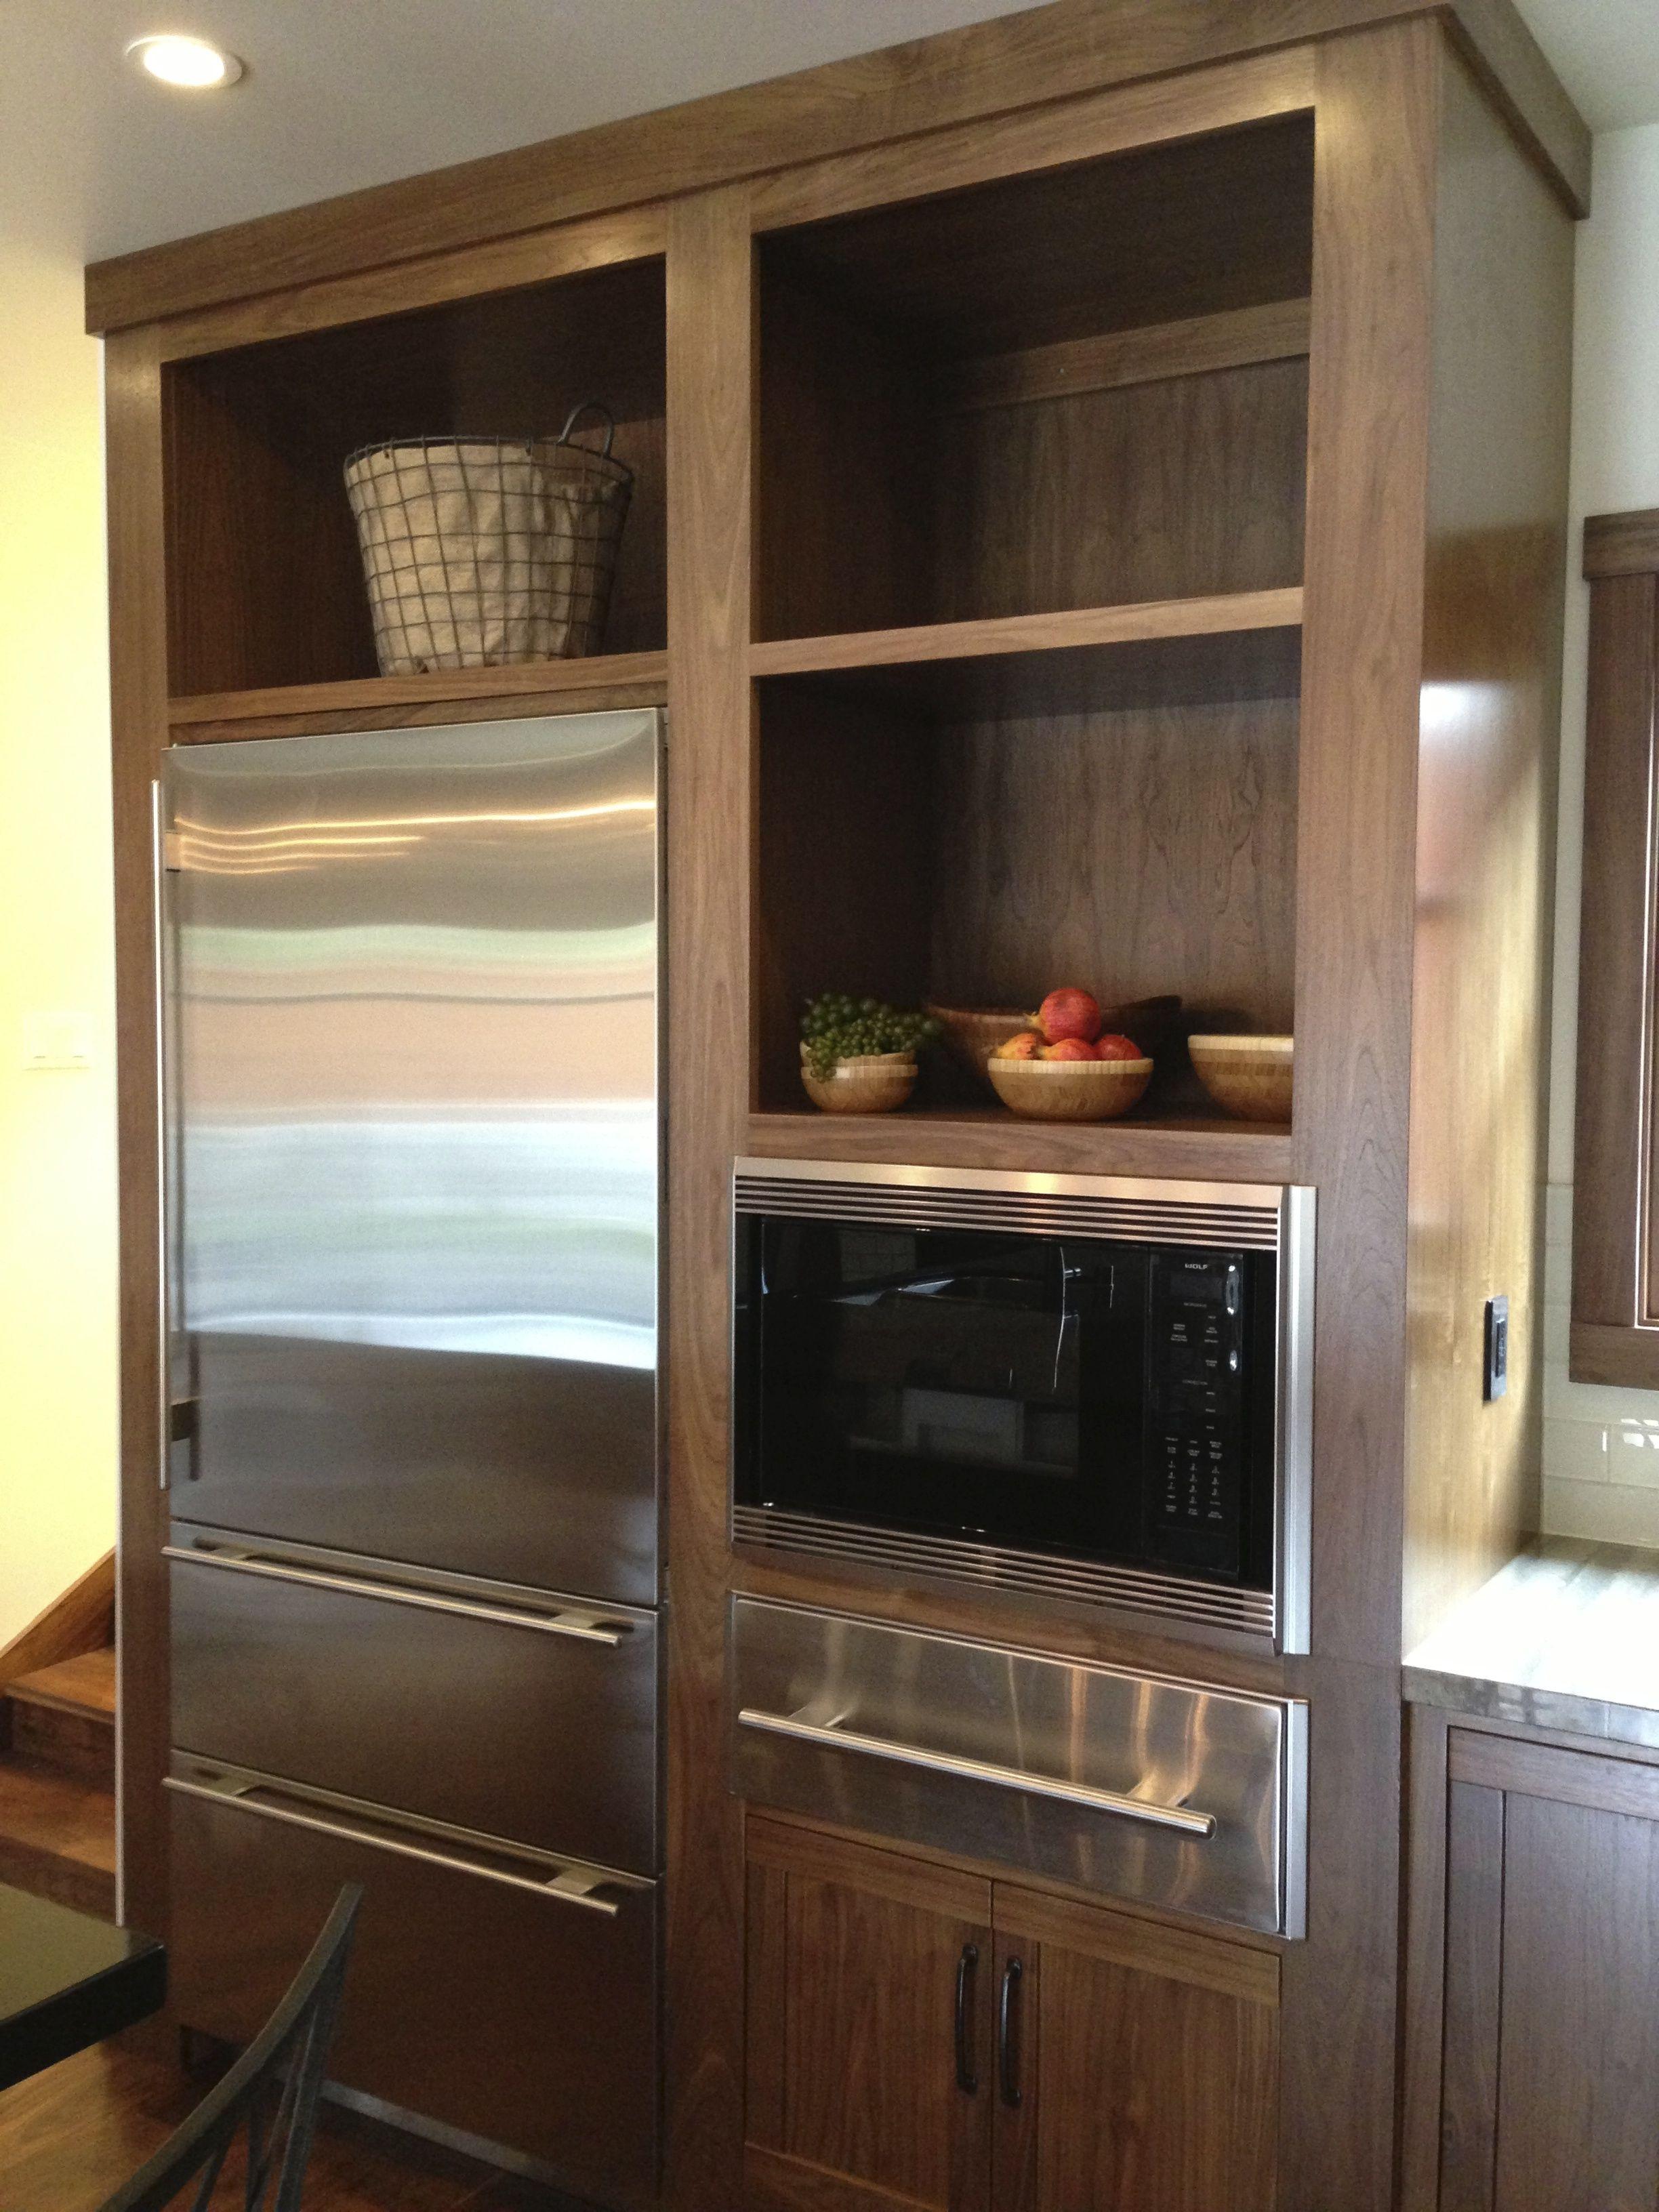 sub drawers r ft frgfwluhuxcj zero cu energy drawer refrigerators refrigeration freezer star bottom ge